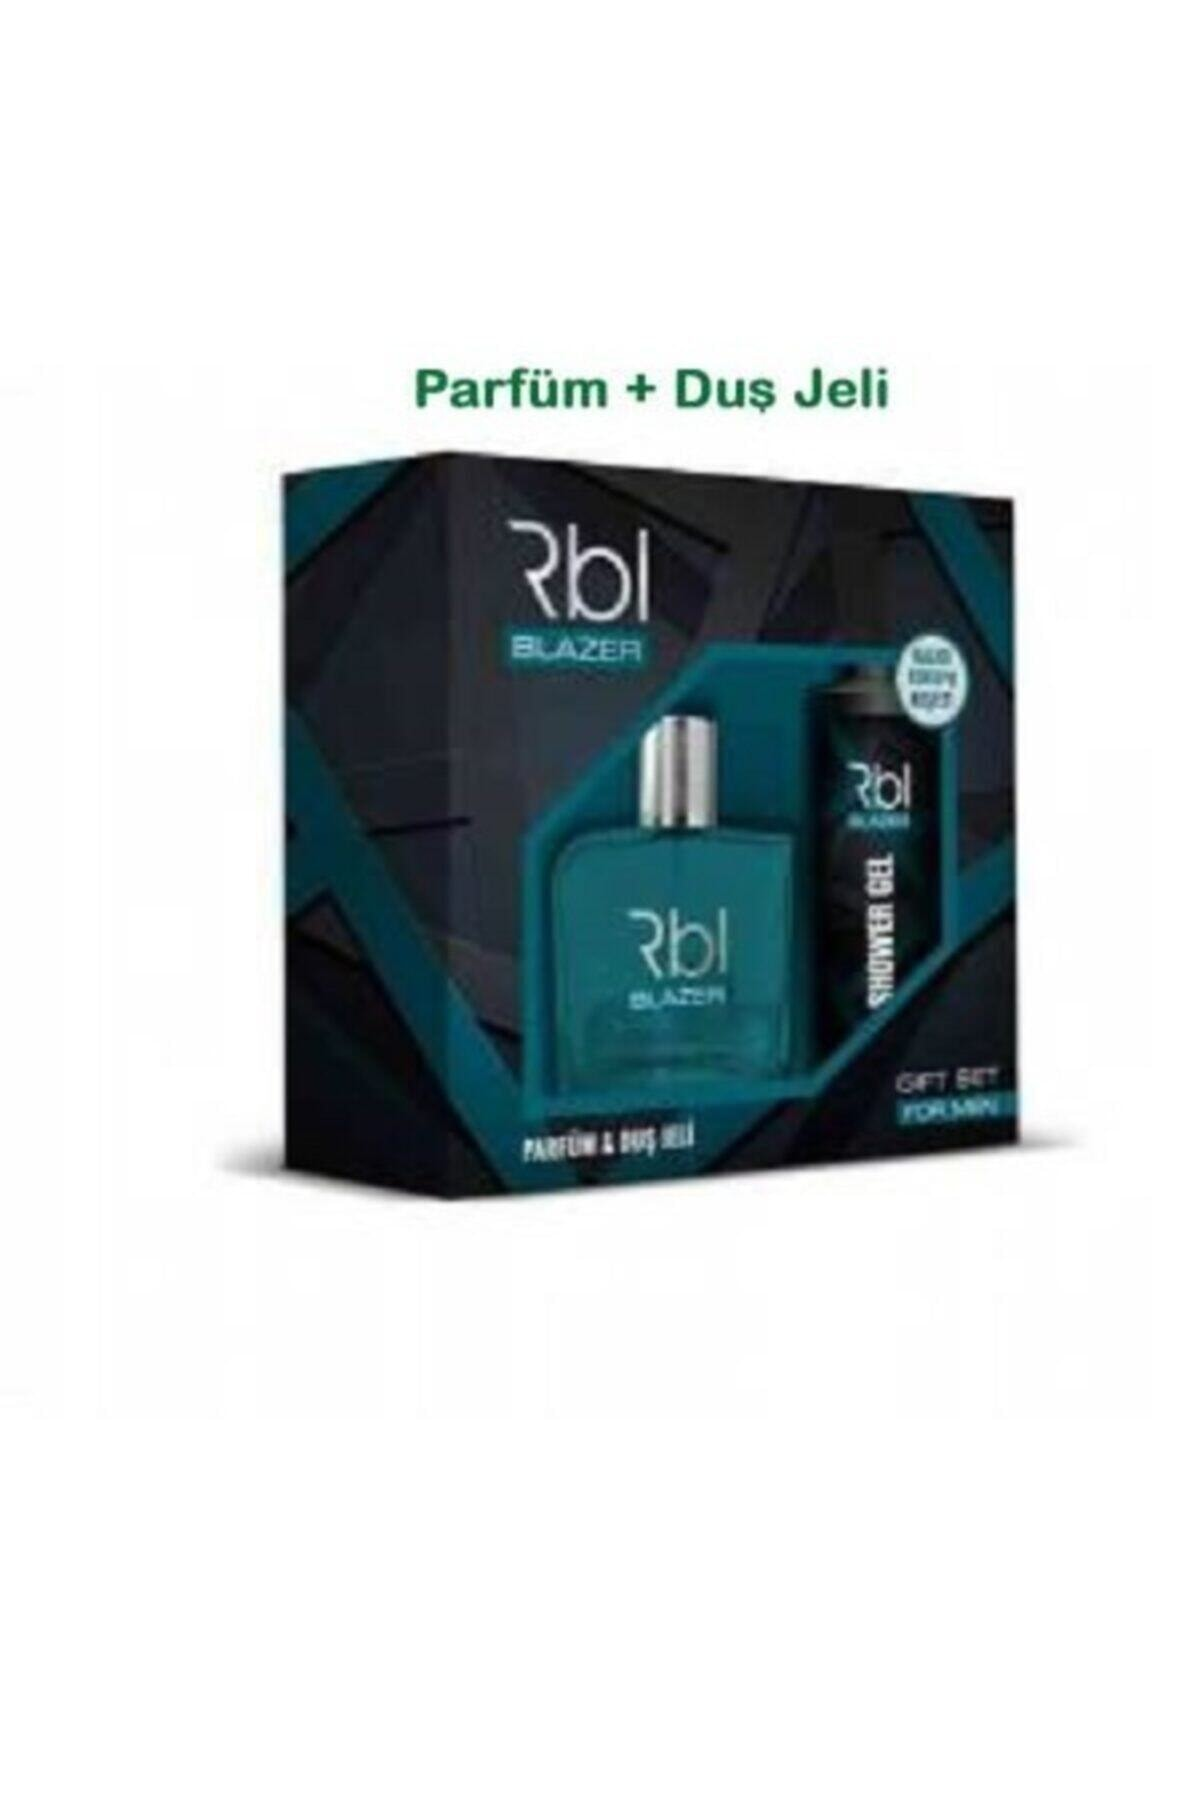 Rebul Orıjınal Rbl Blazer 90 Ml Parfüm + 200 Ml Duş Jeli Ikili Set 1